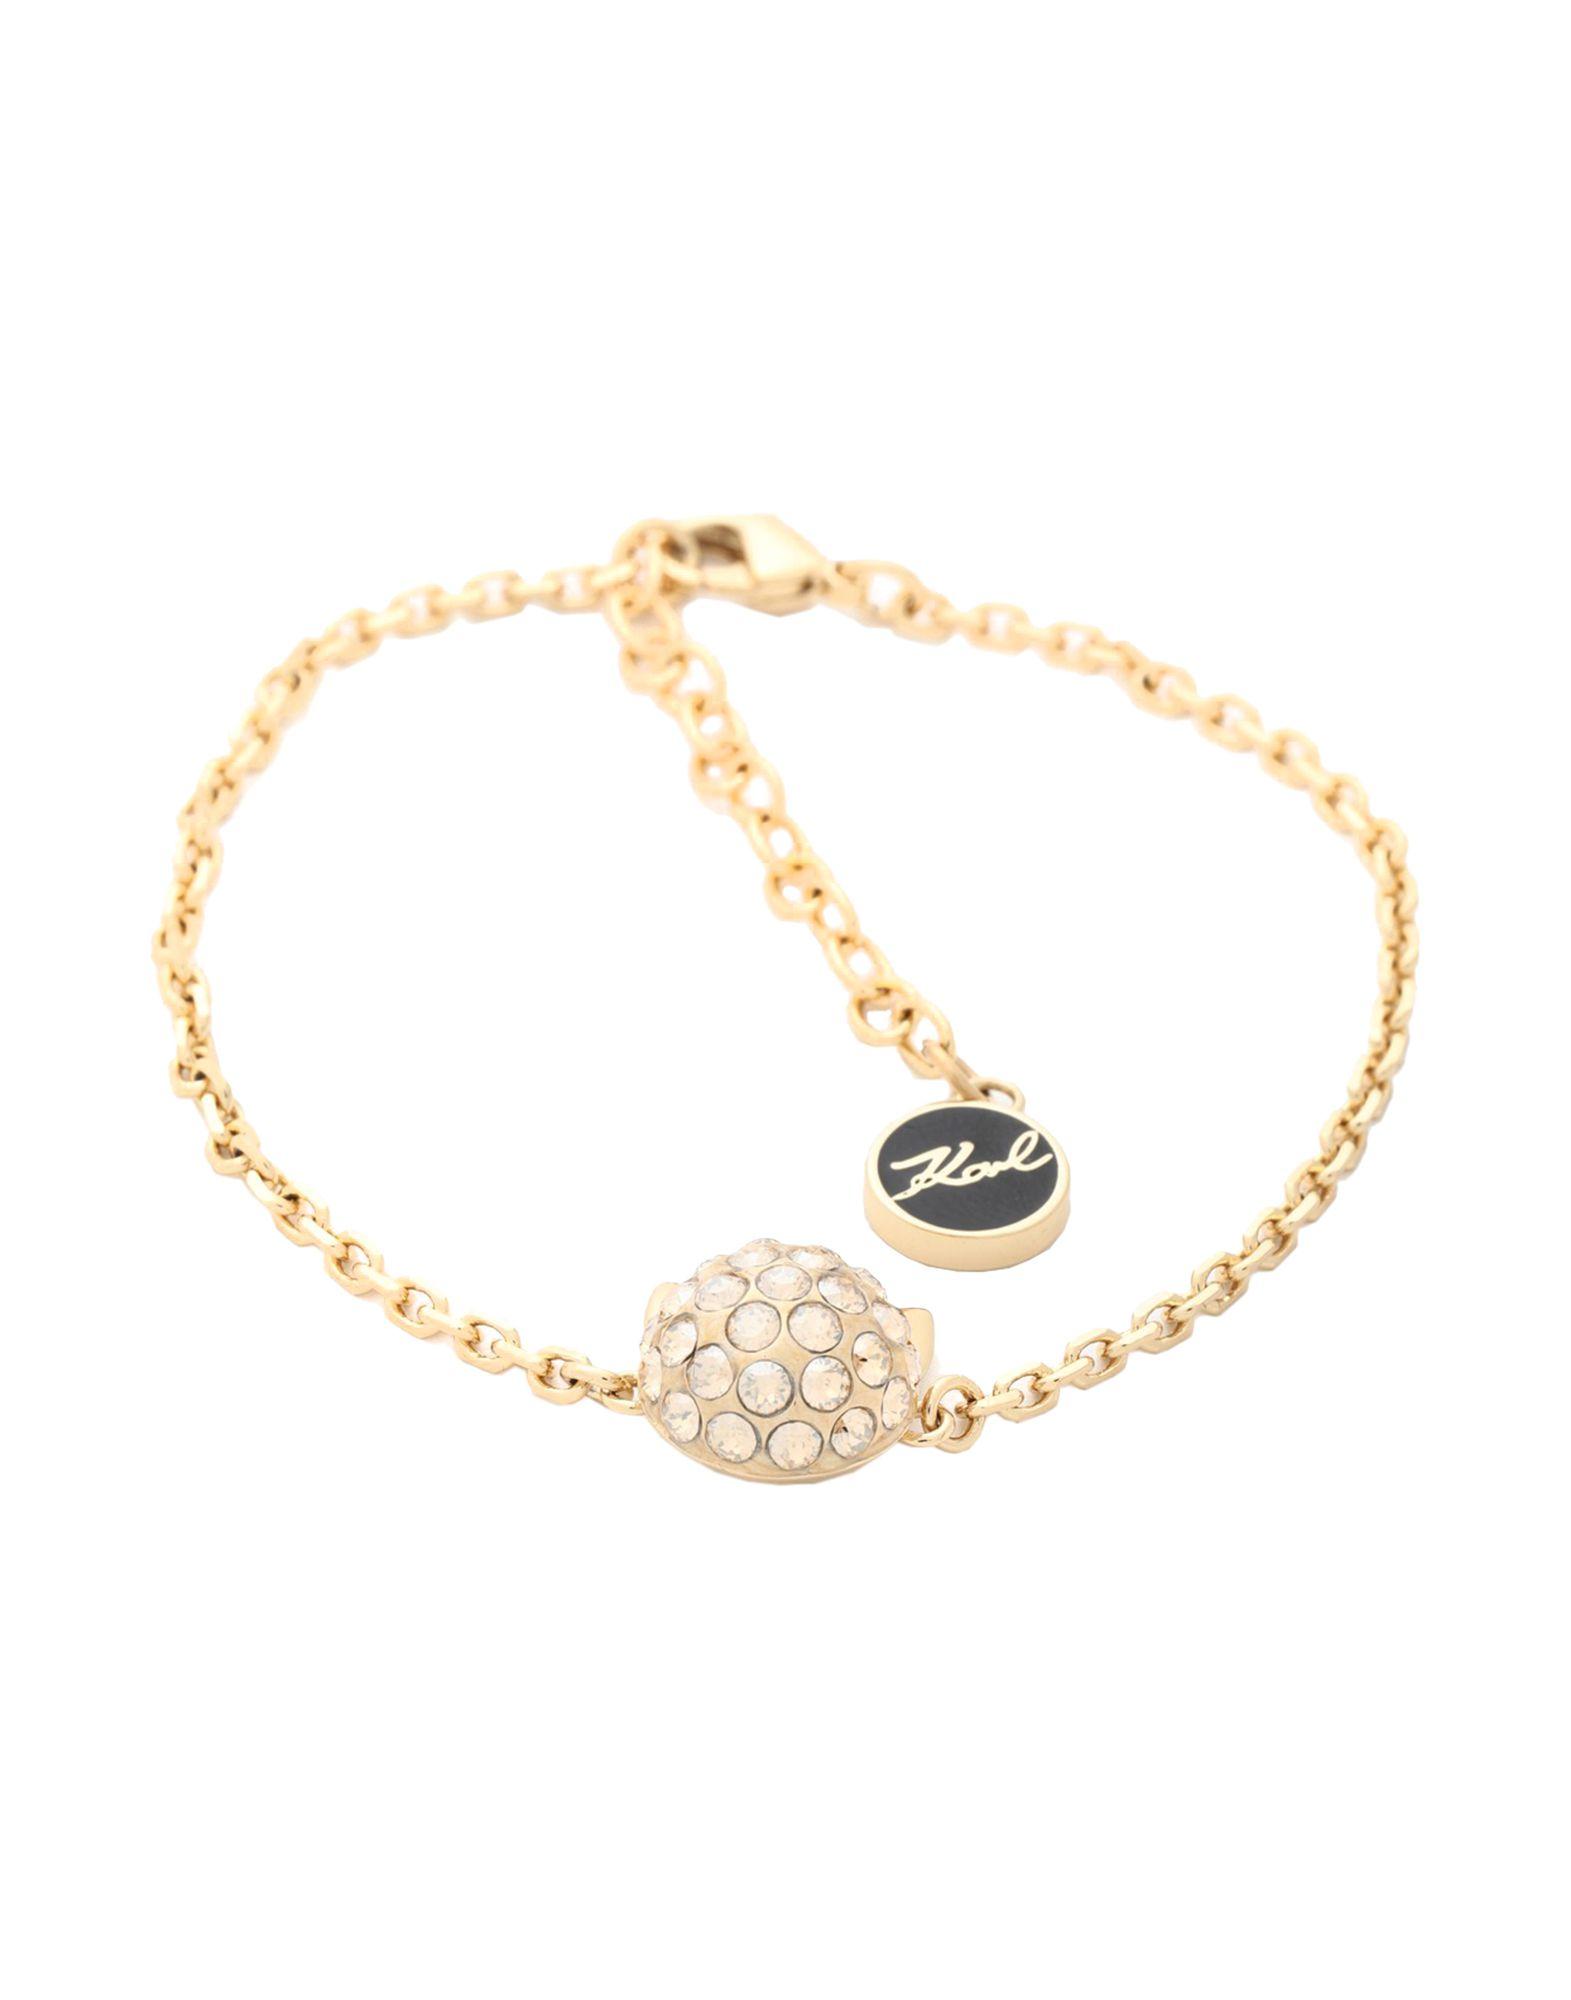 KARL LAGERFELD Bracelets - Item 50243580